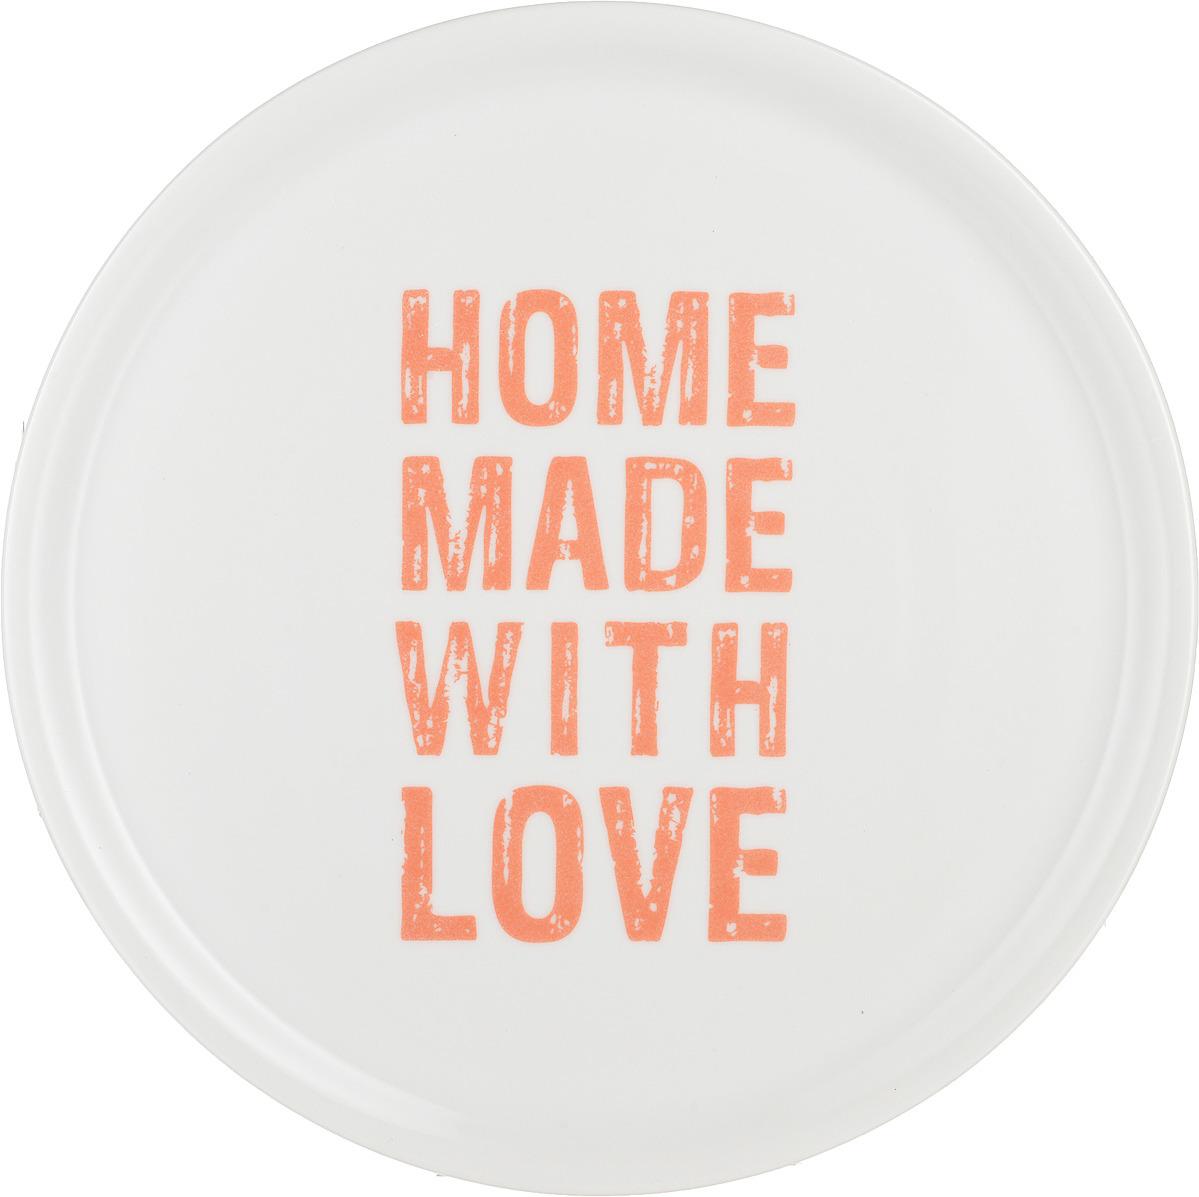 Тарелка для пиццы Tescoma Home Made With Love, цвет: белый, оранжевый, диаметр 33 см тарелка tescoma legend 385324